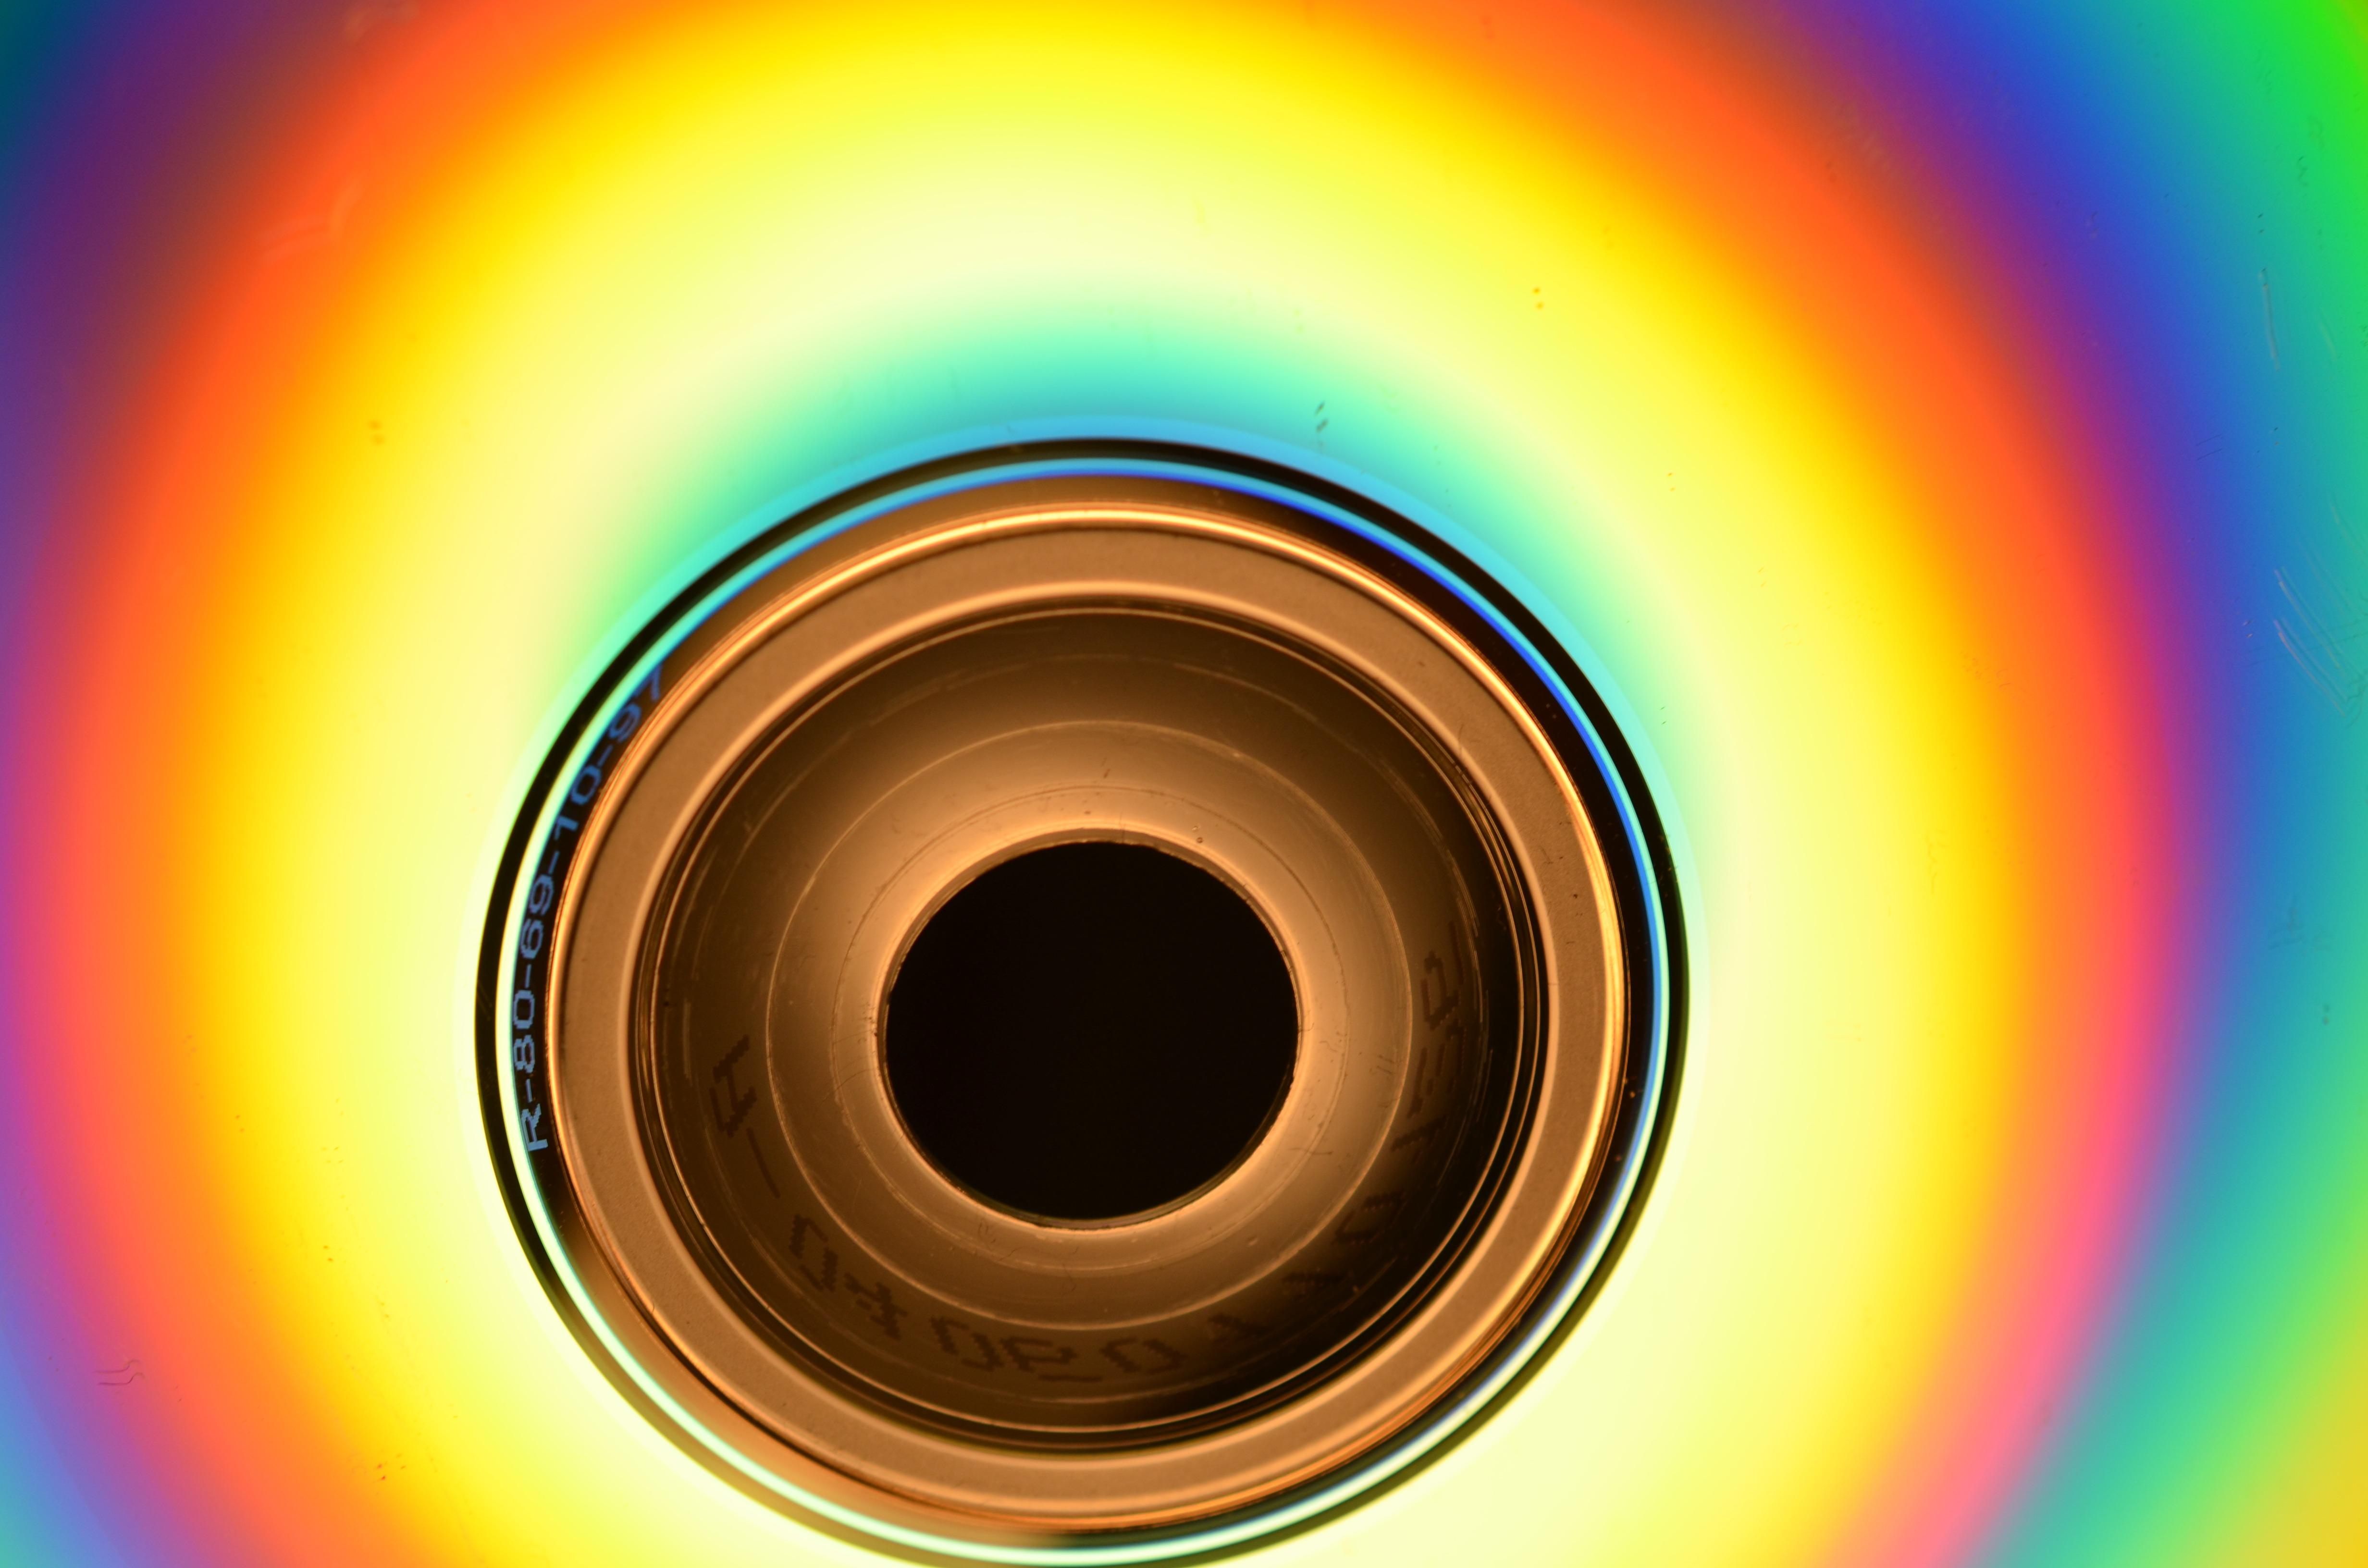 Free Images Light Technology Wheel Spiral Line Color